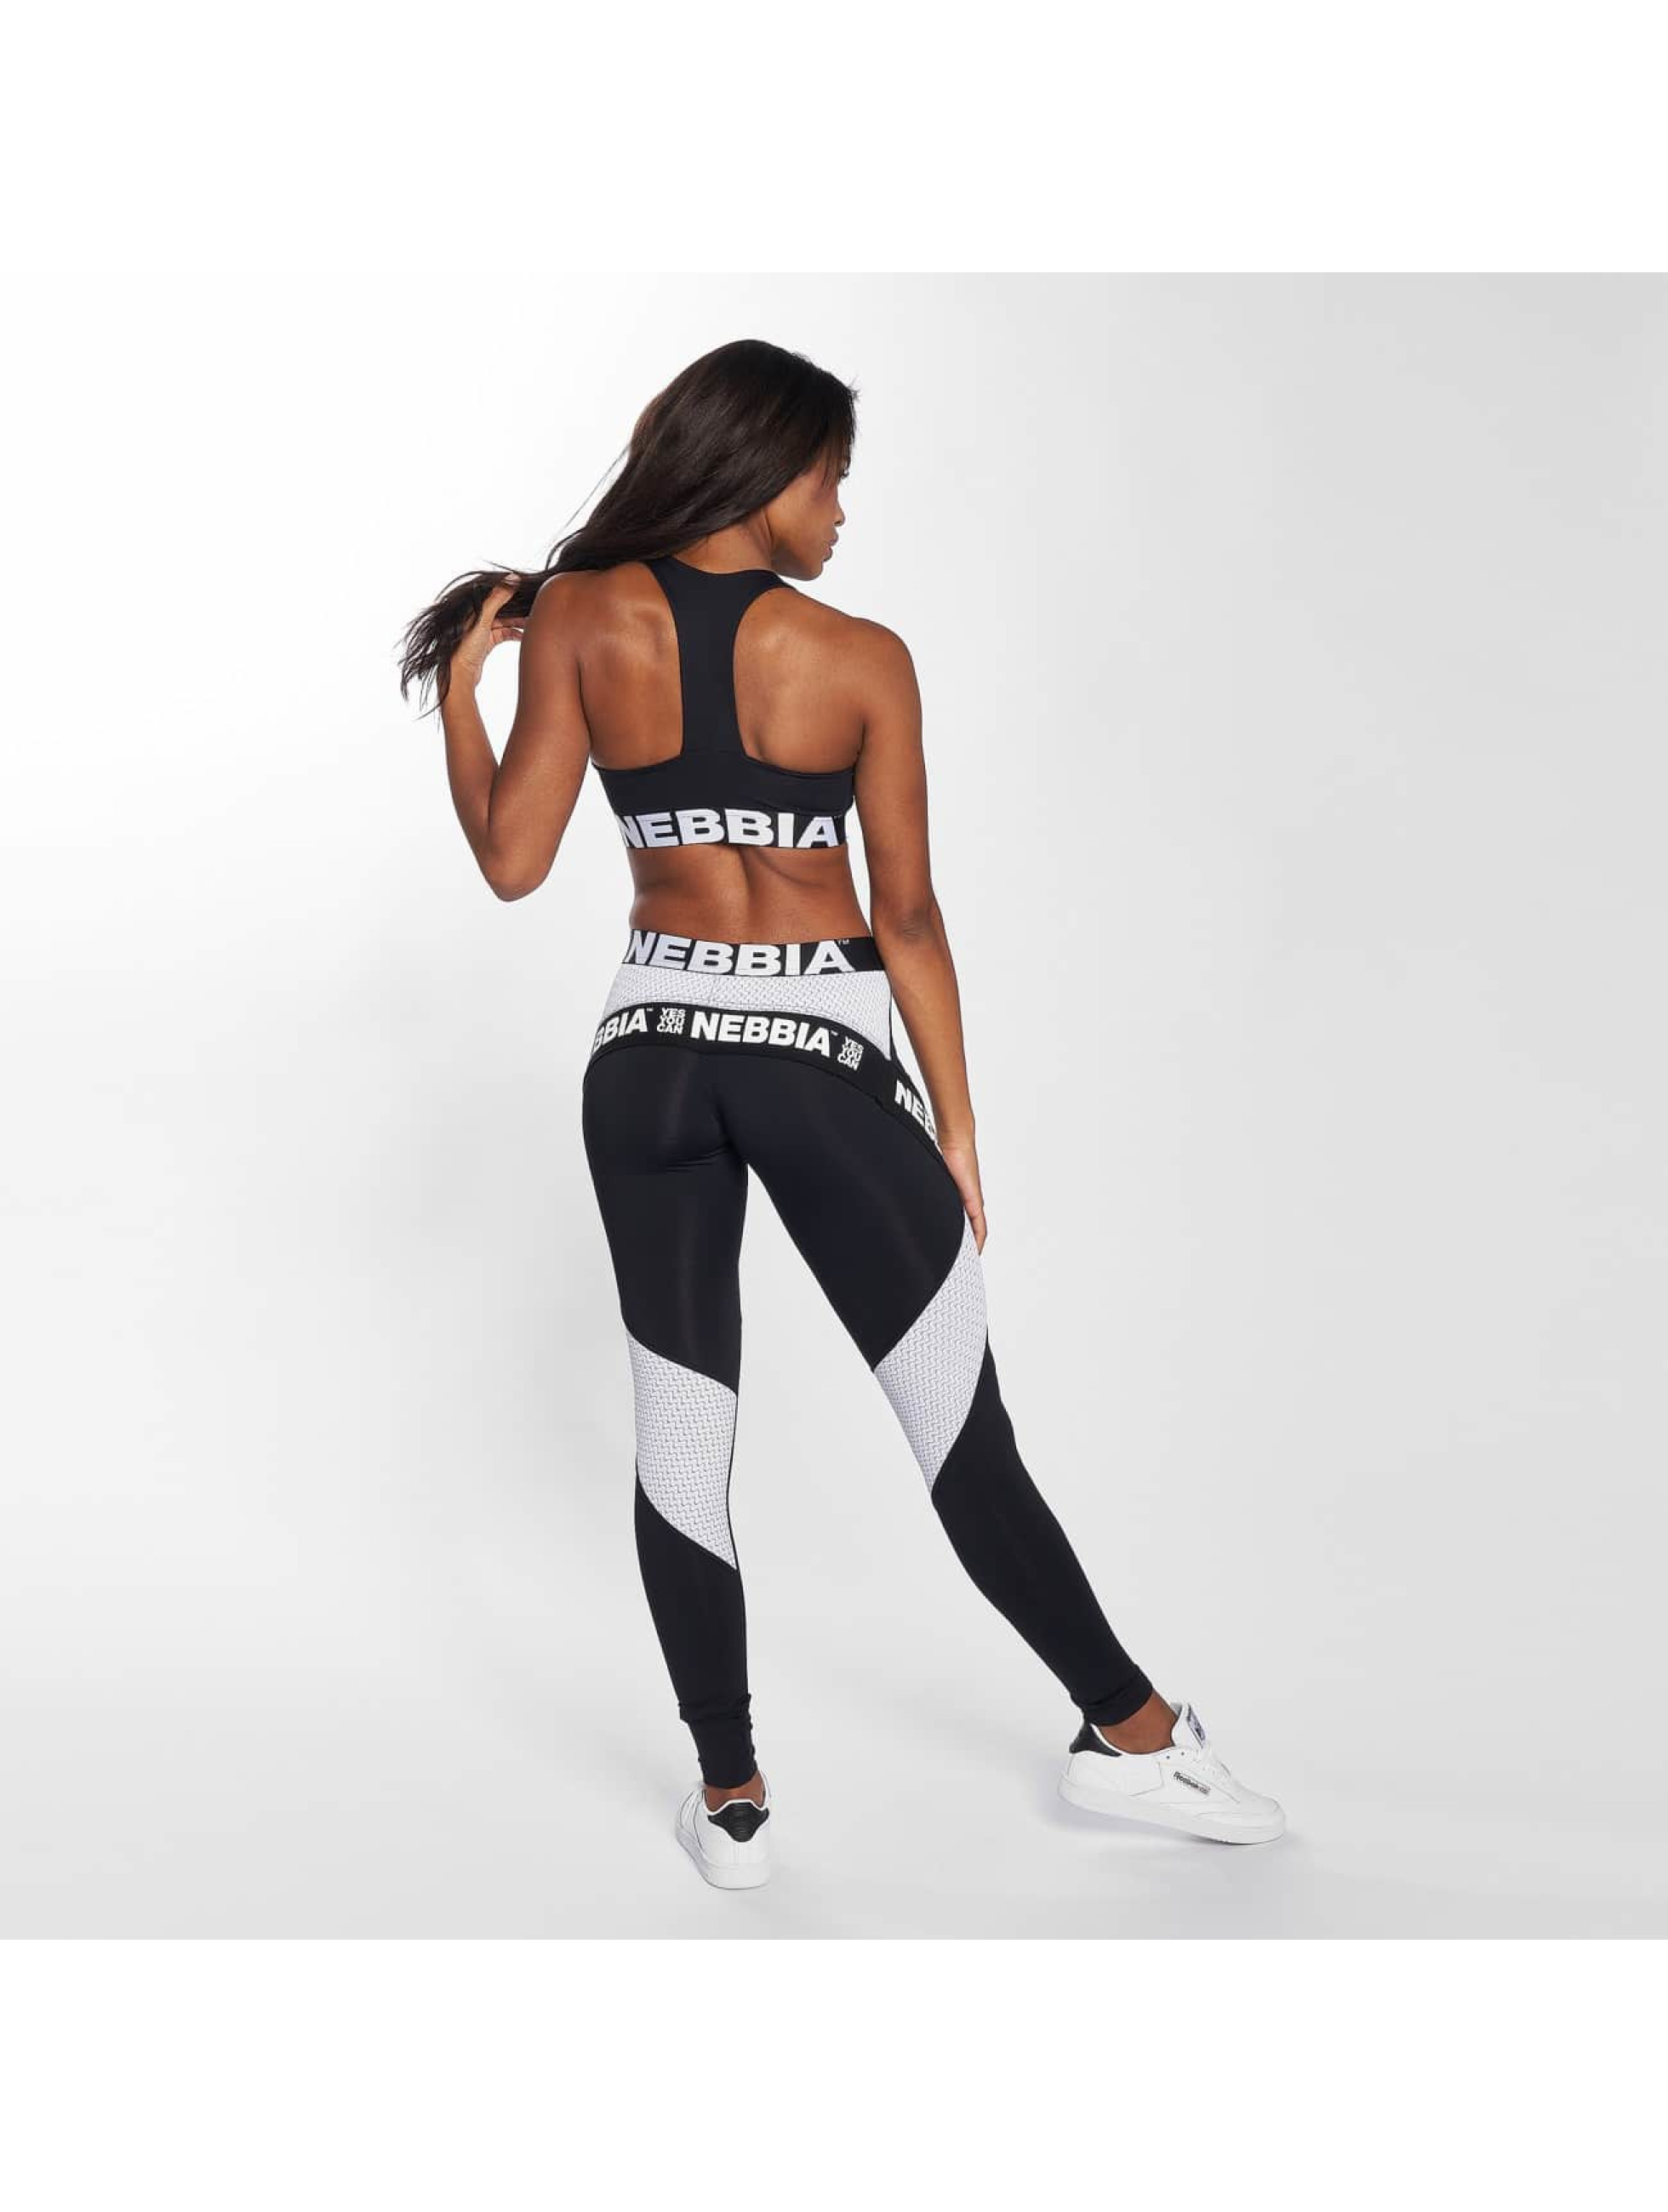 Nebbia Underwear Elegance black